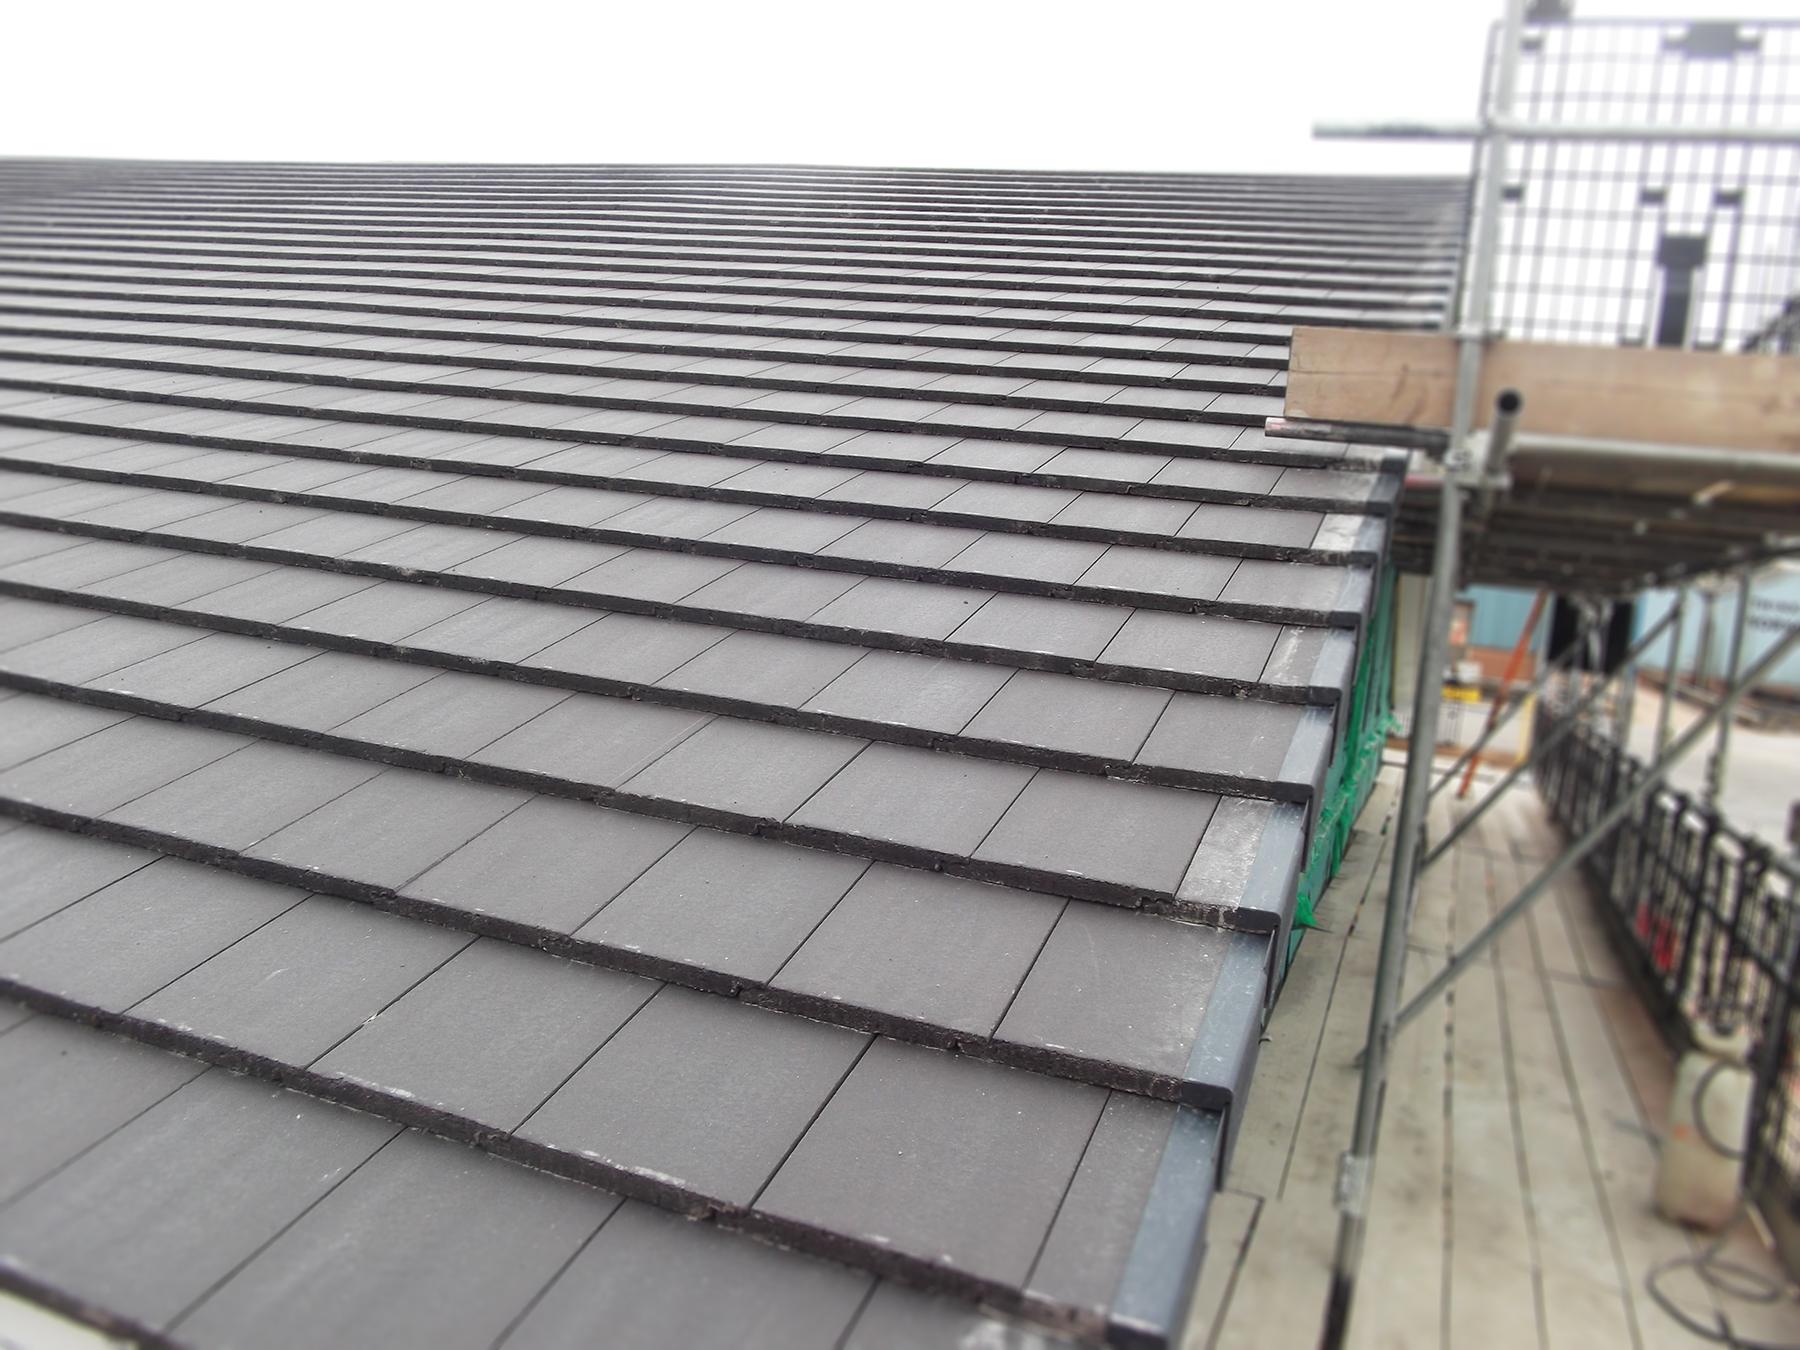 Calderdale grey tiles